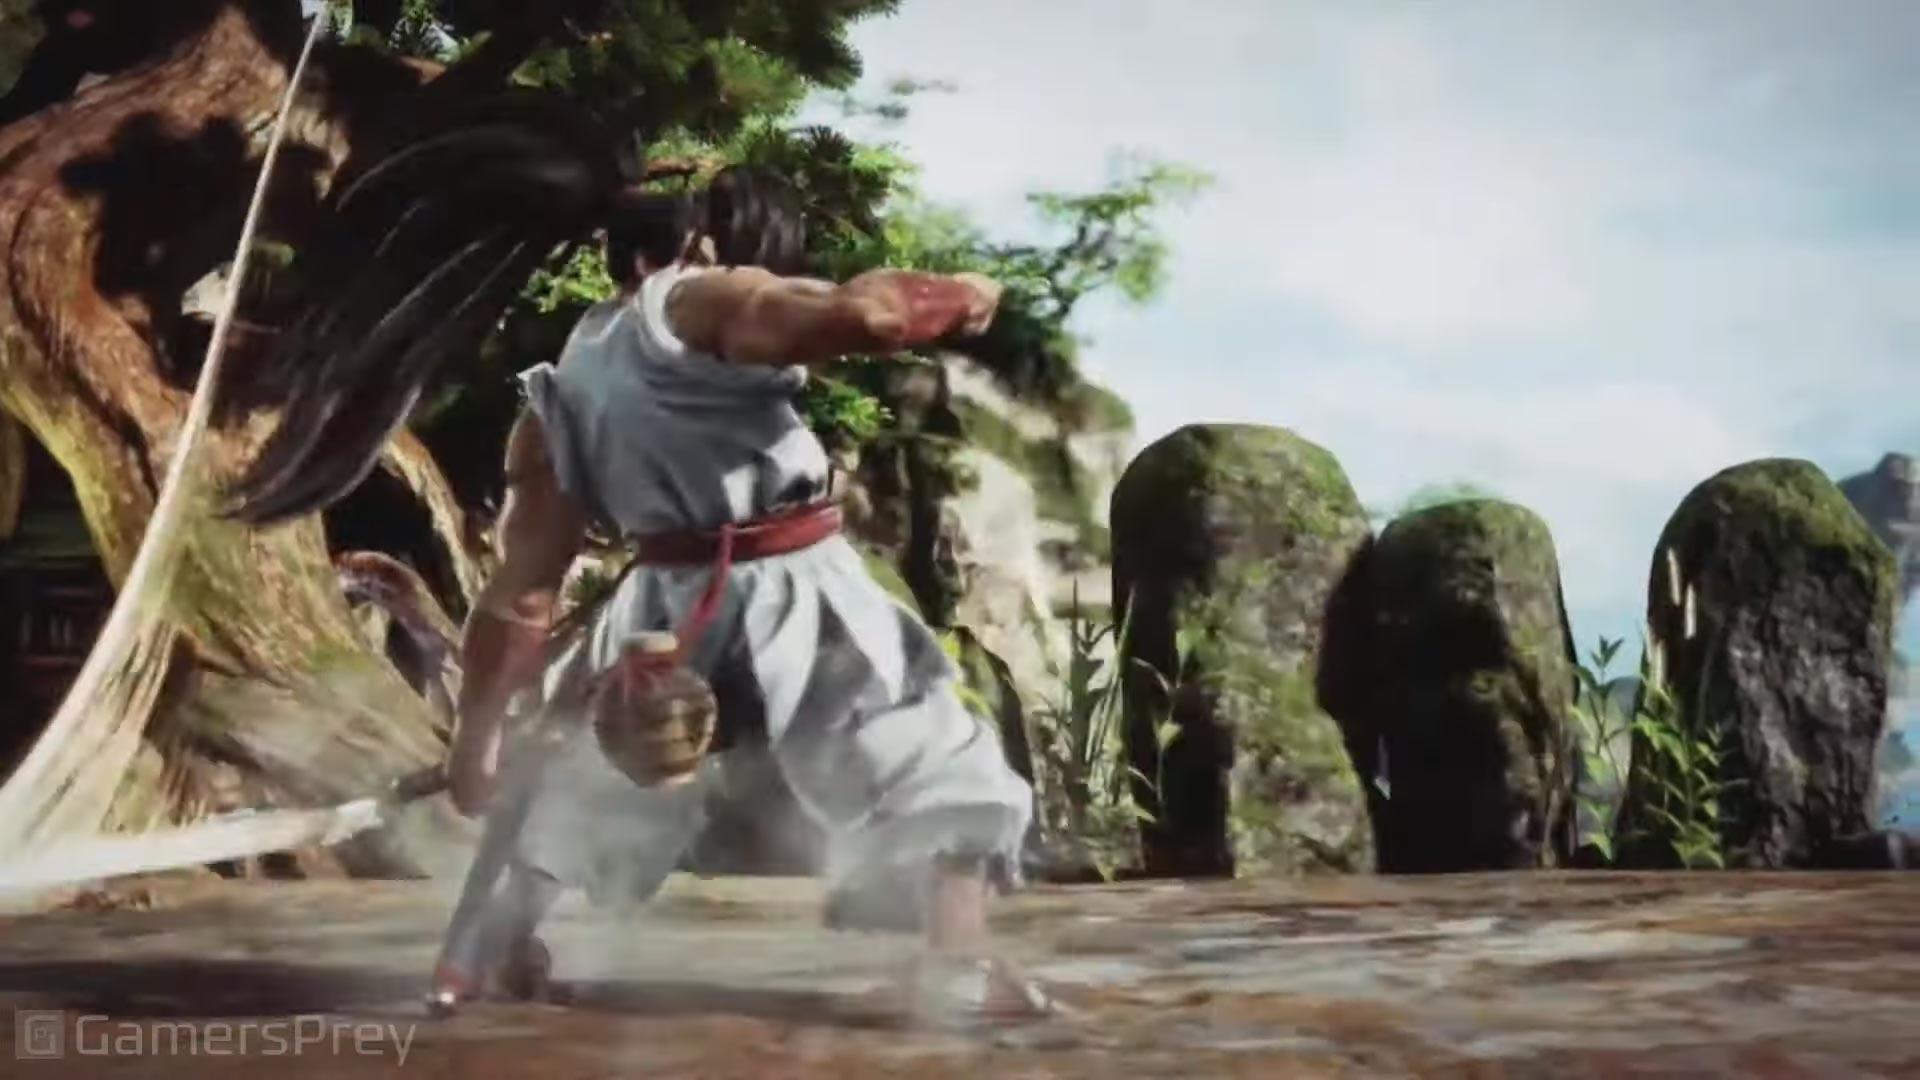 Soul Calibur 6 Haohmaru Trailer Screenshot Gallery 3 out of 6 image gallery